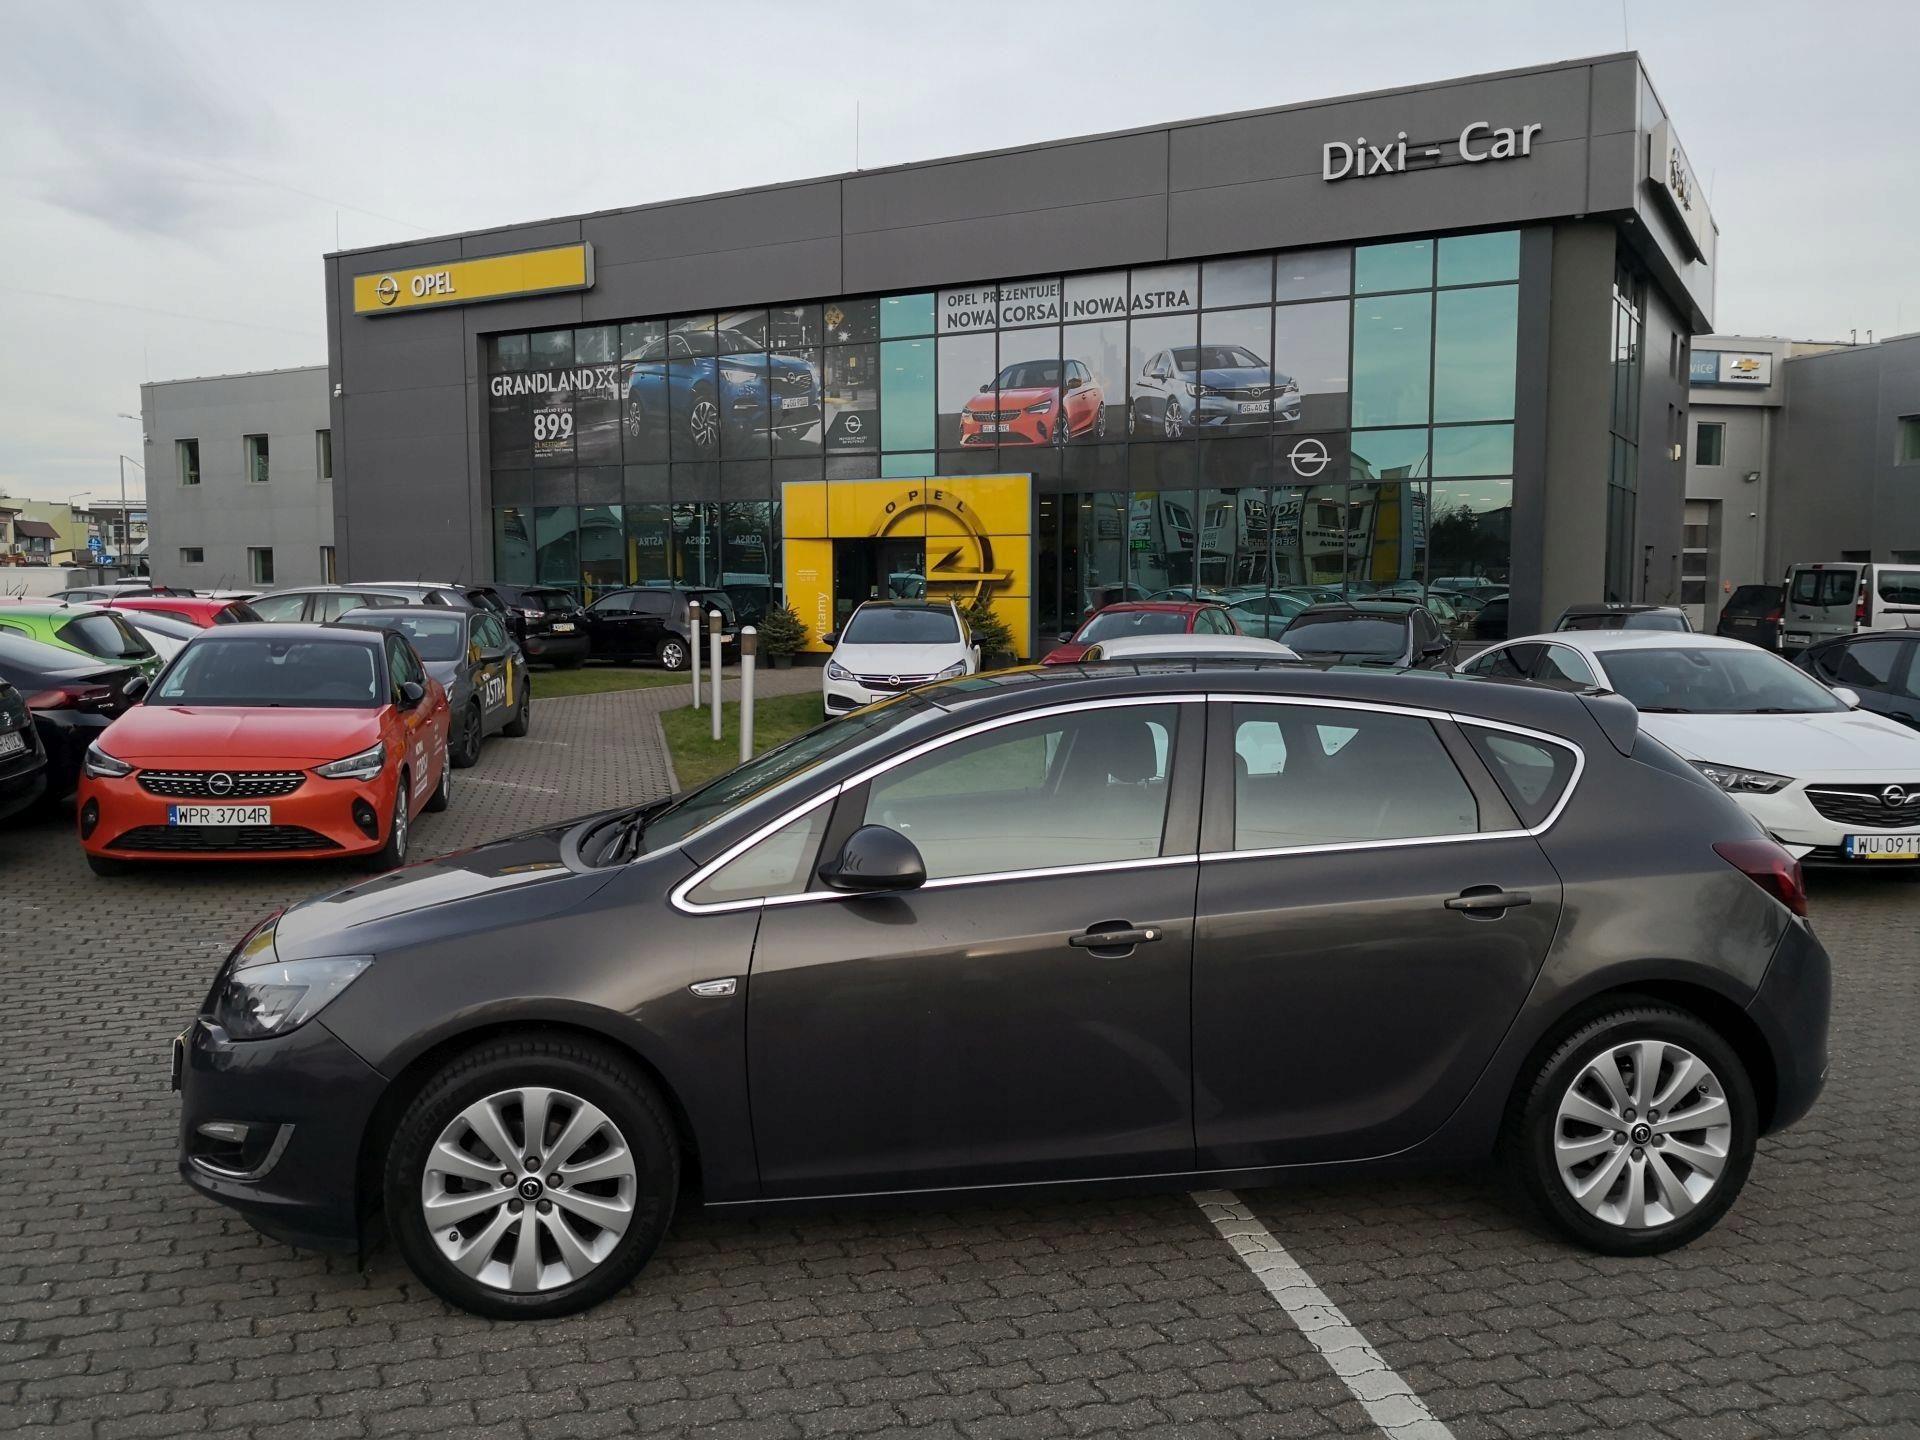 Фото Opel Astra OPC - фотографии, фото салона Opel Astra OPC, J ...   1440x1920